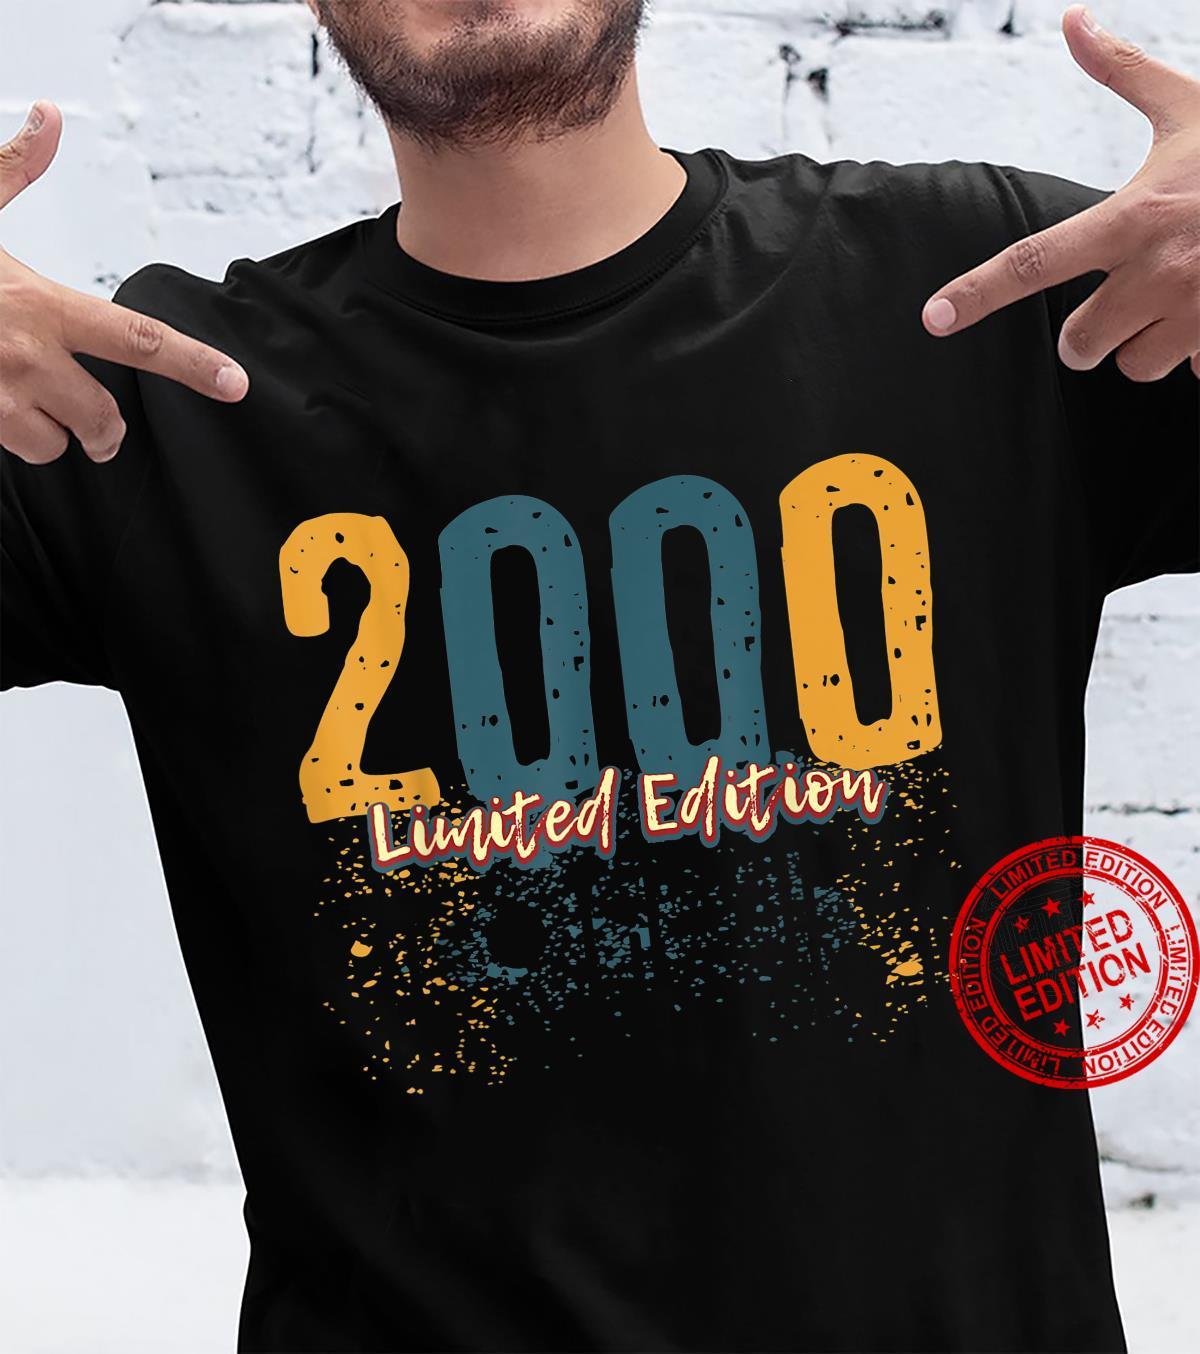 21. Geburtstag Damen Herren 21 Jahre Jahrgang 2000 Geschenk Shirt